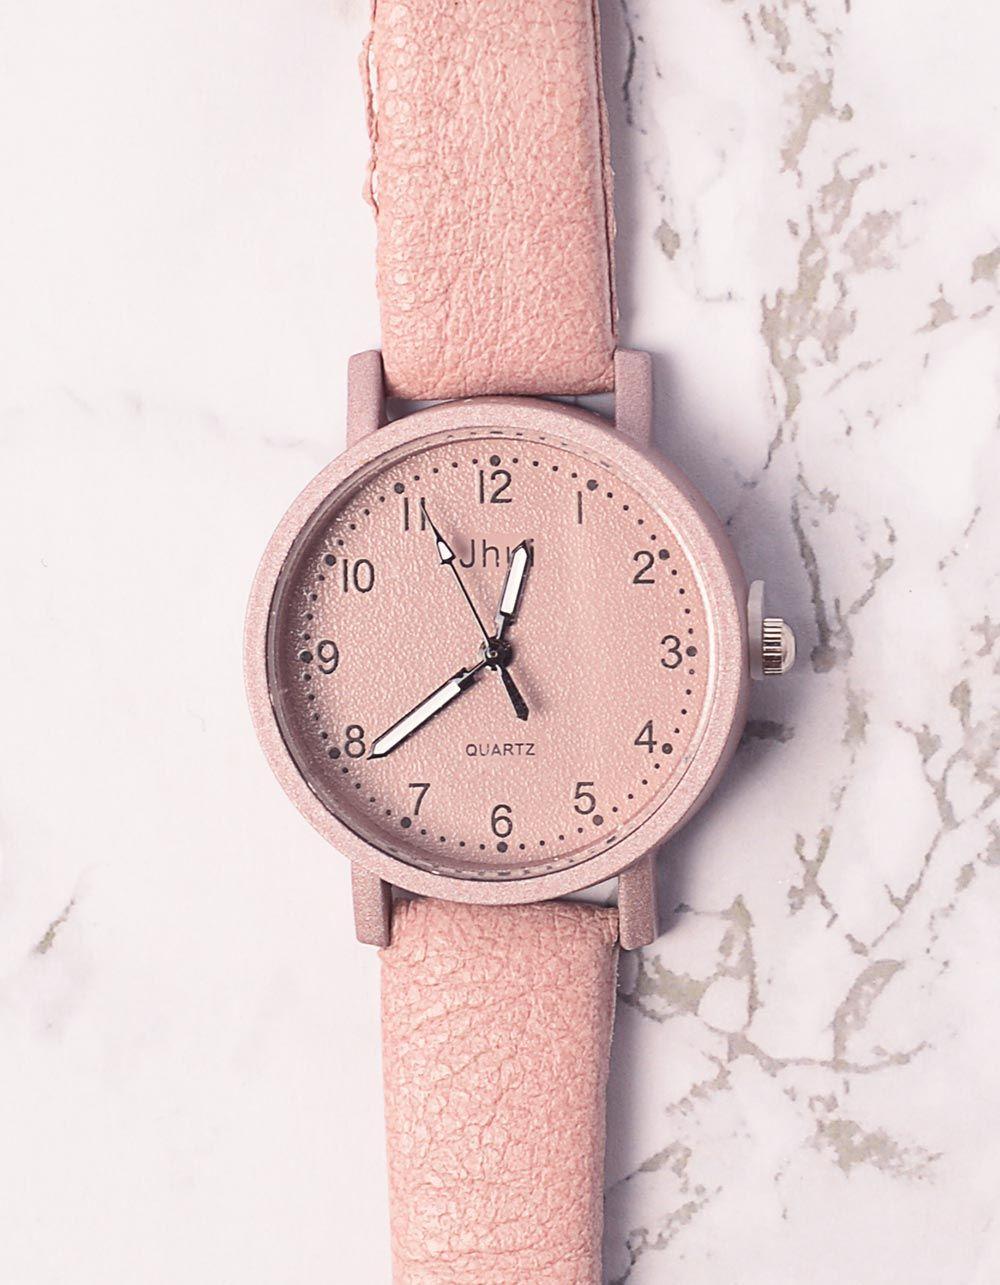 Годинник на руку з круглим циферблатом | 240467-39-XX